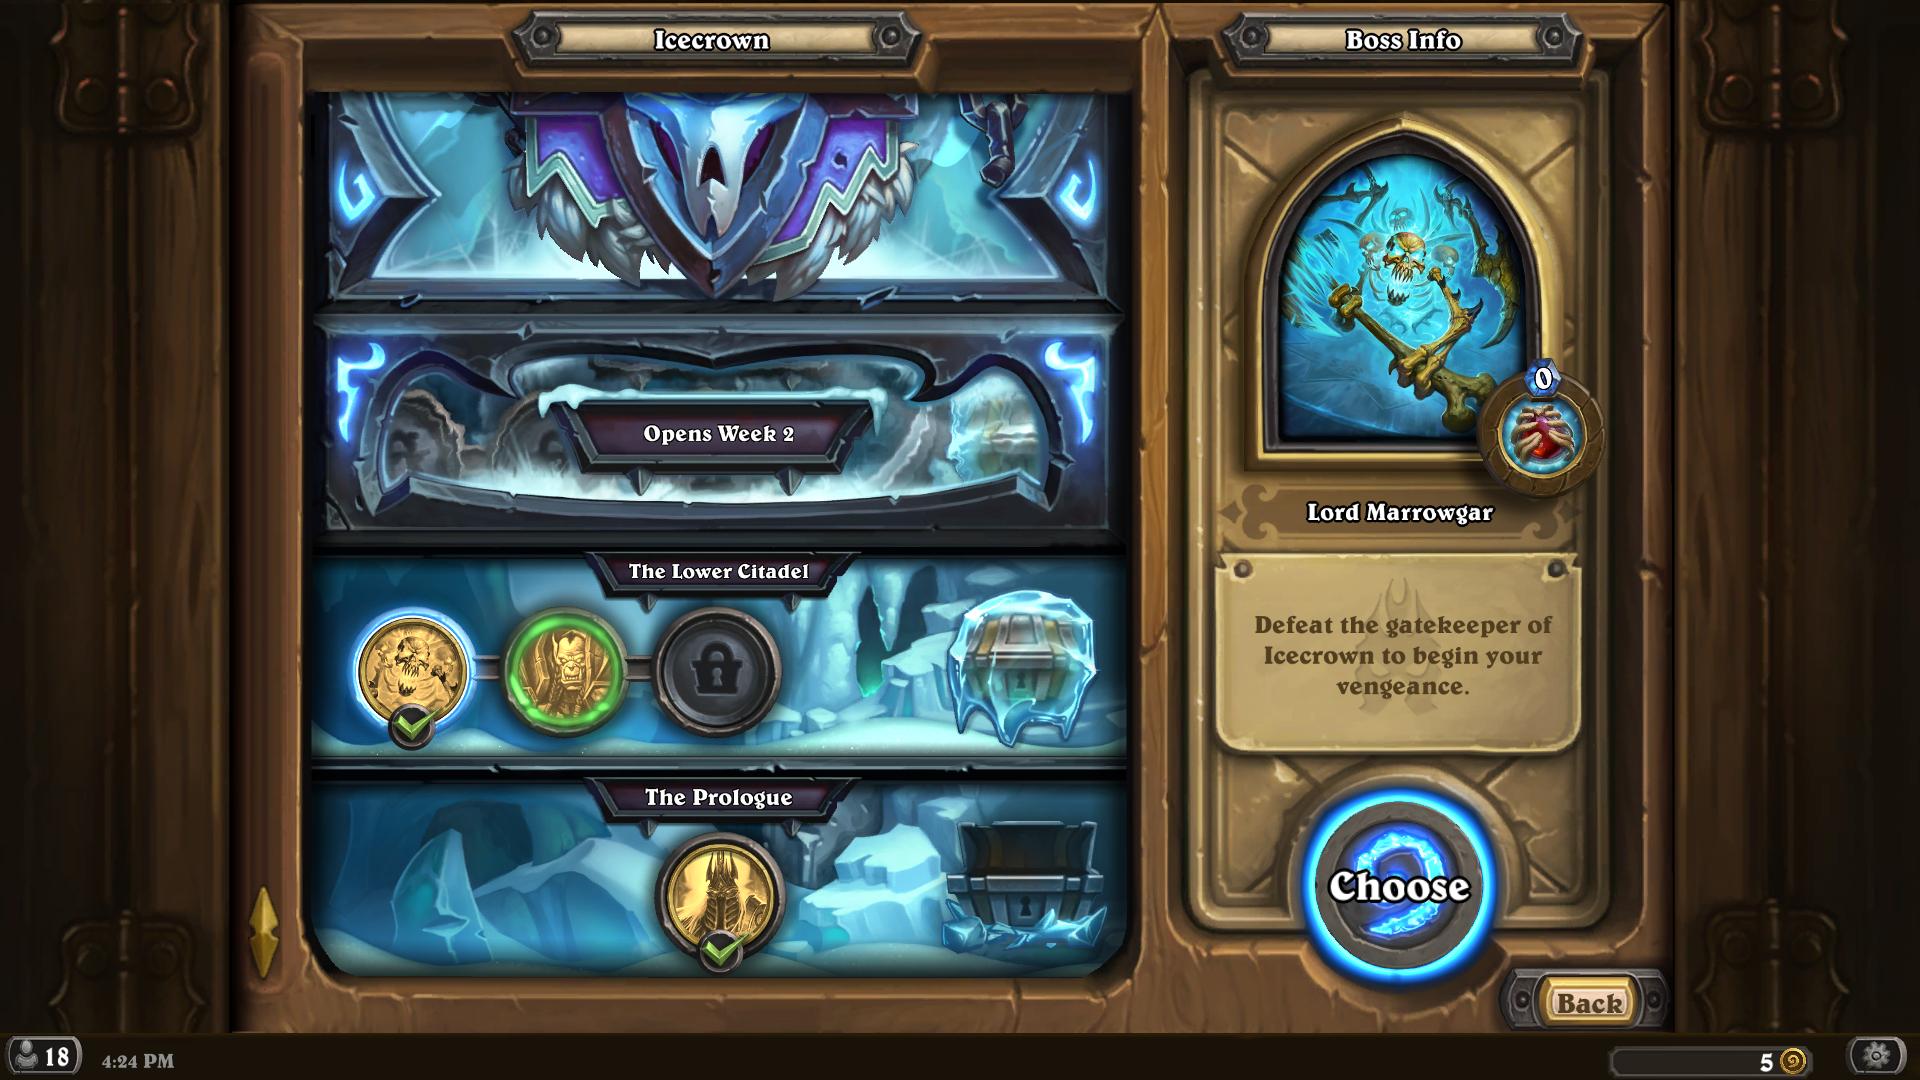 Deathbringer Saurfang Boss Guide - The Lower Citadel - Frozen Throne